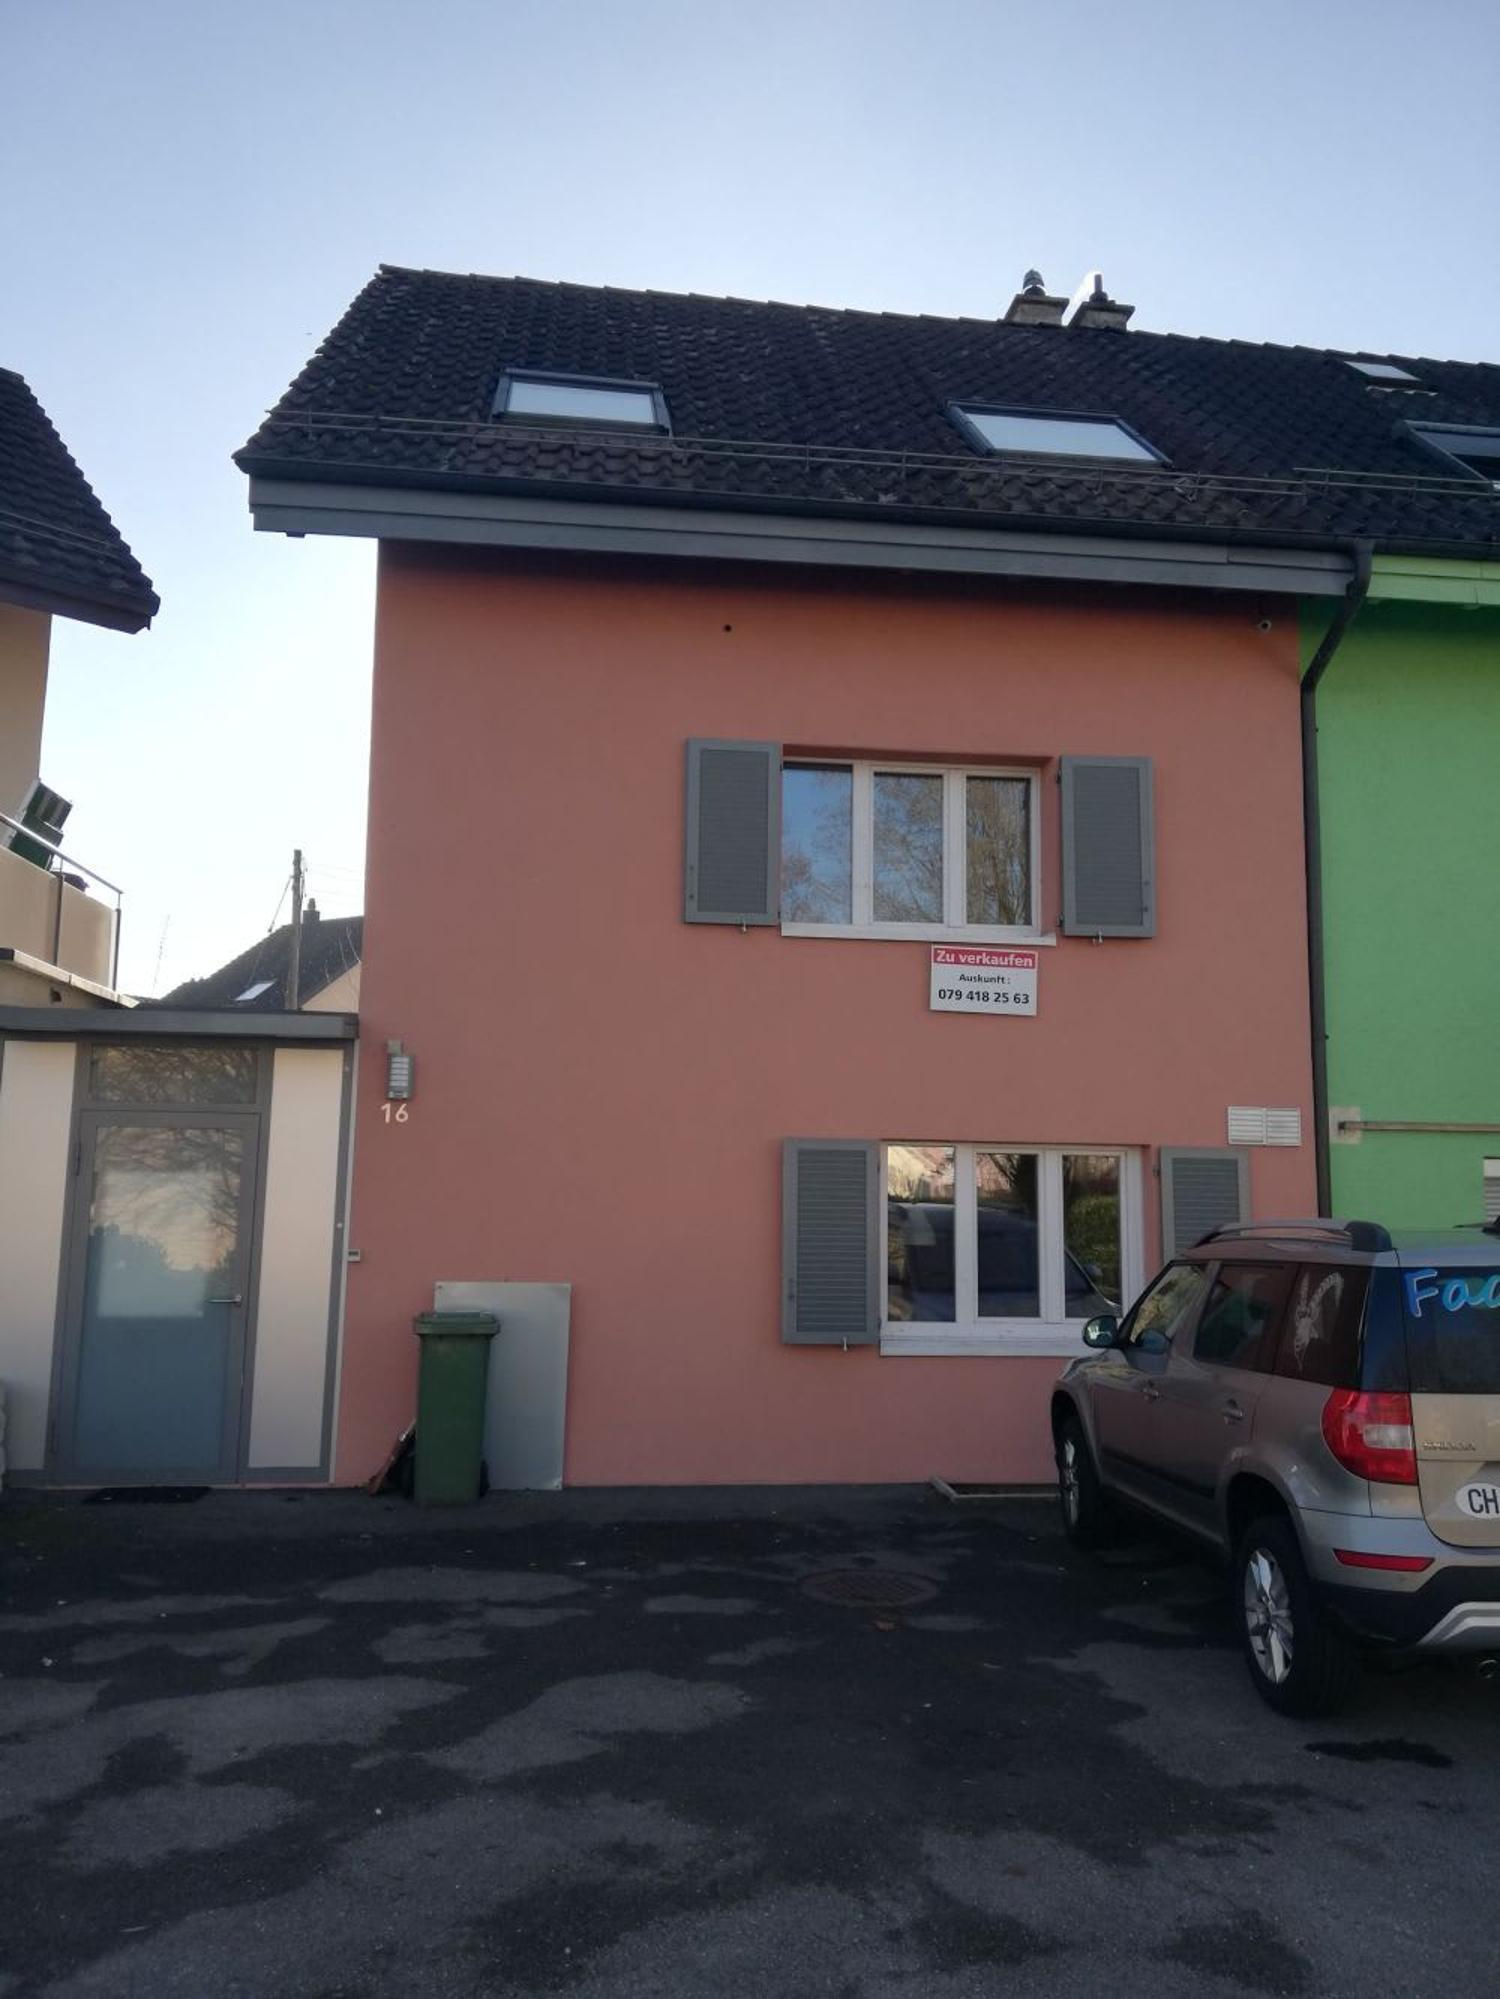 Rent Apartment in Niederhasli - schulersrest.com